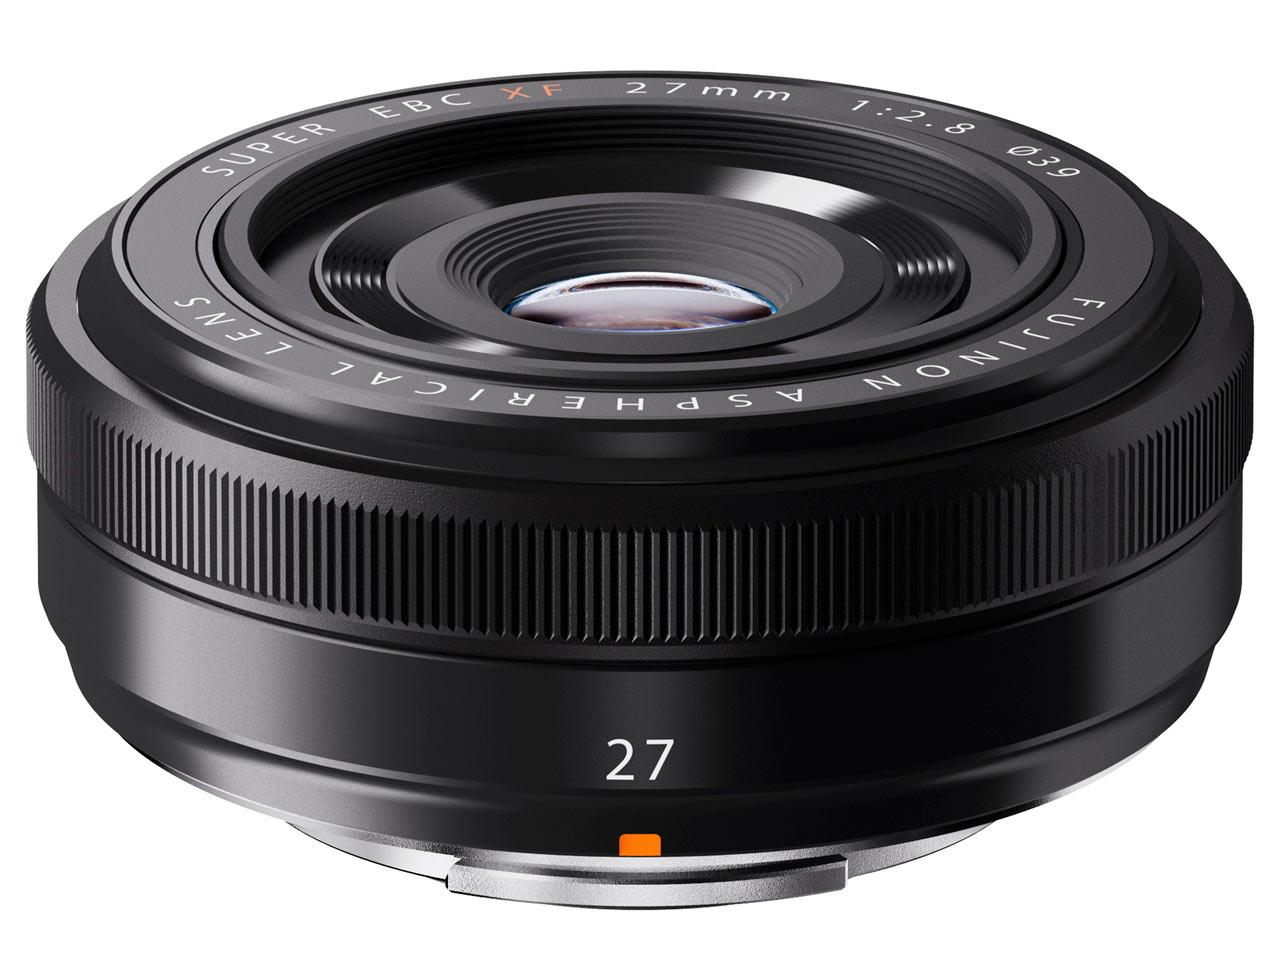 Fujifilm announced the XF 27mm f/2.8 pancake lens